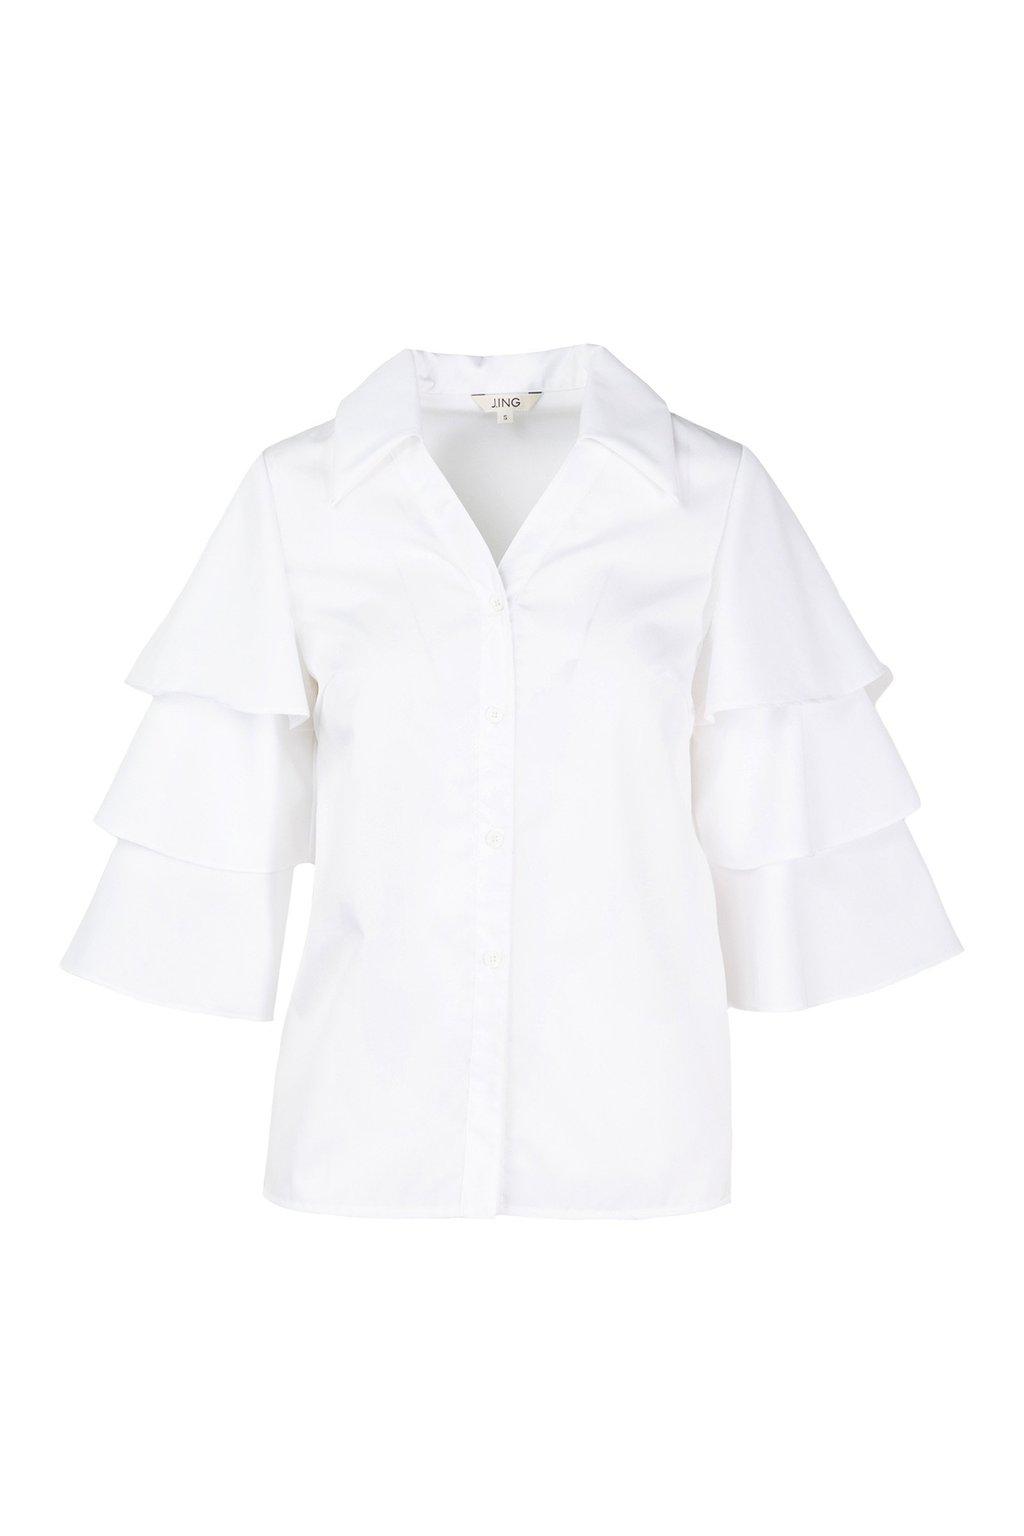 Tiered Lana Blouse by J.ING women's clothing